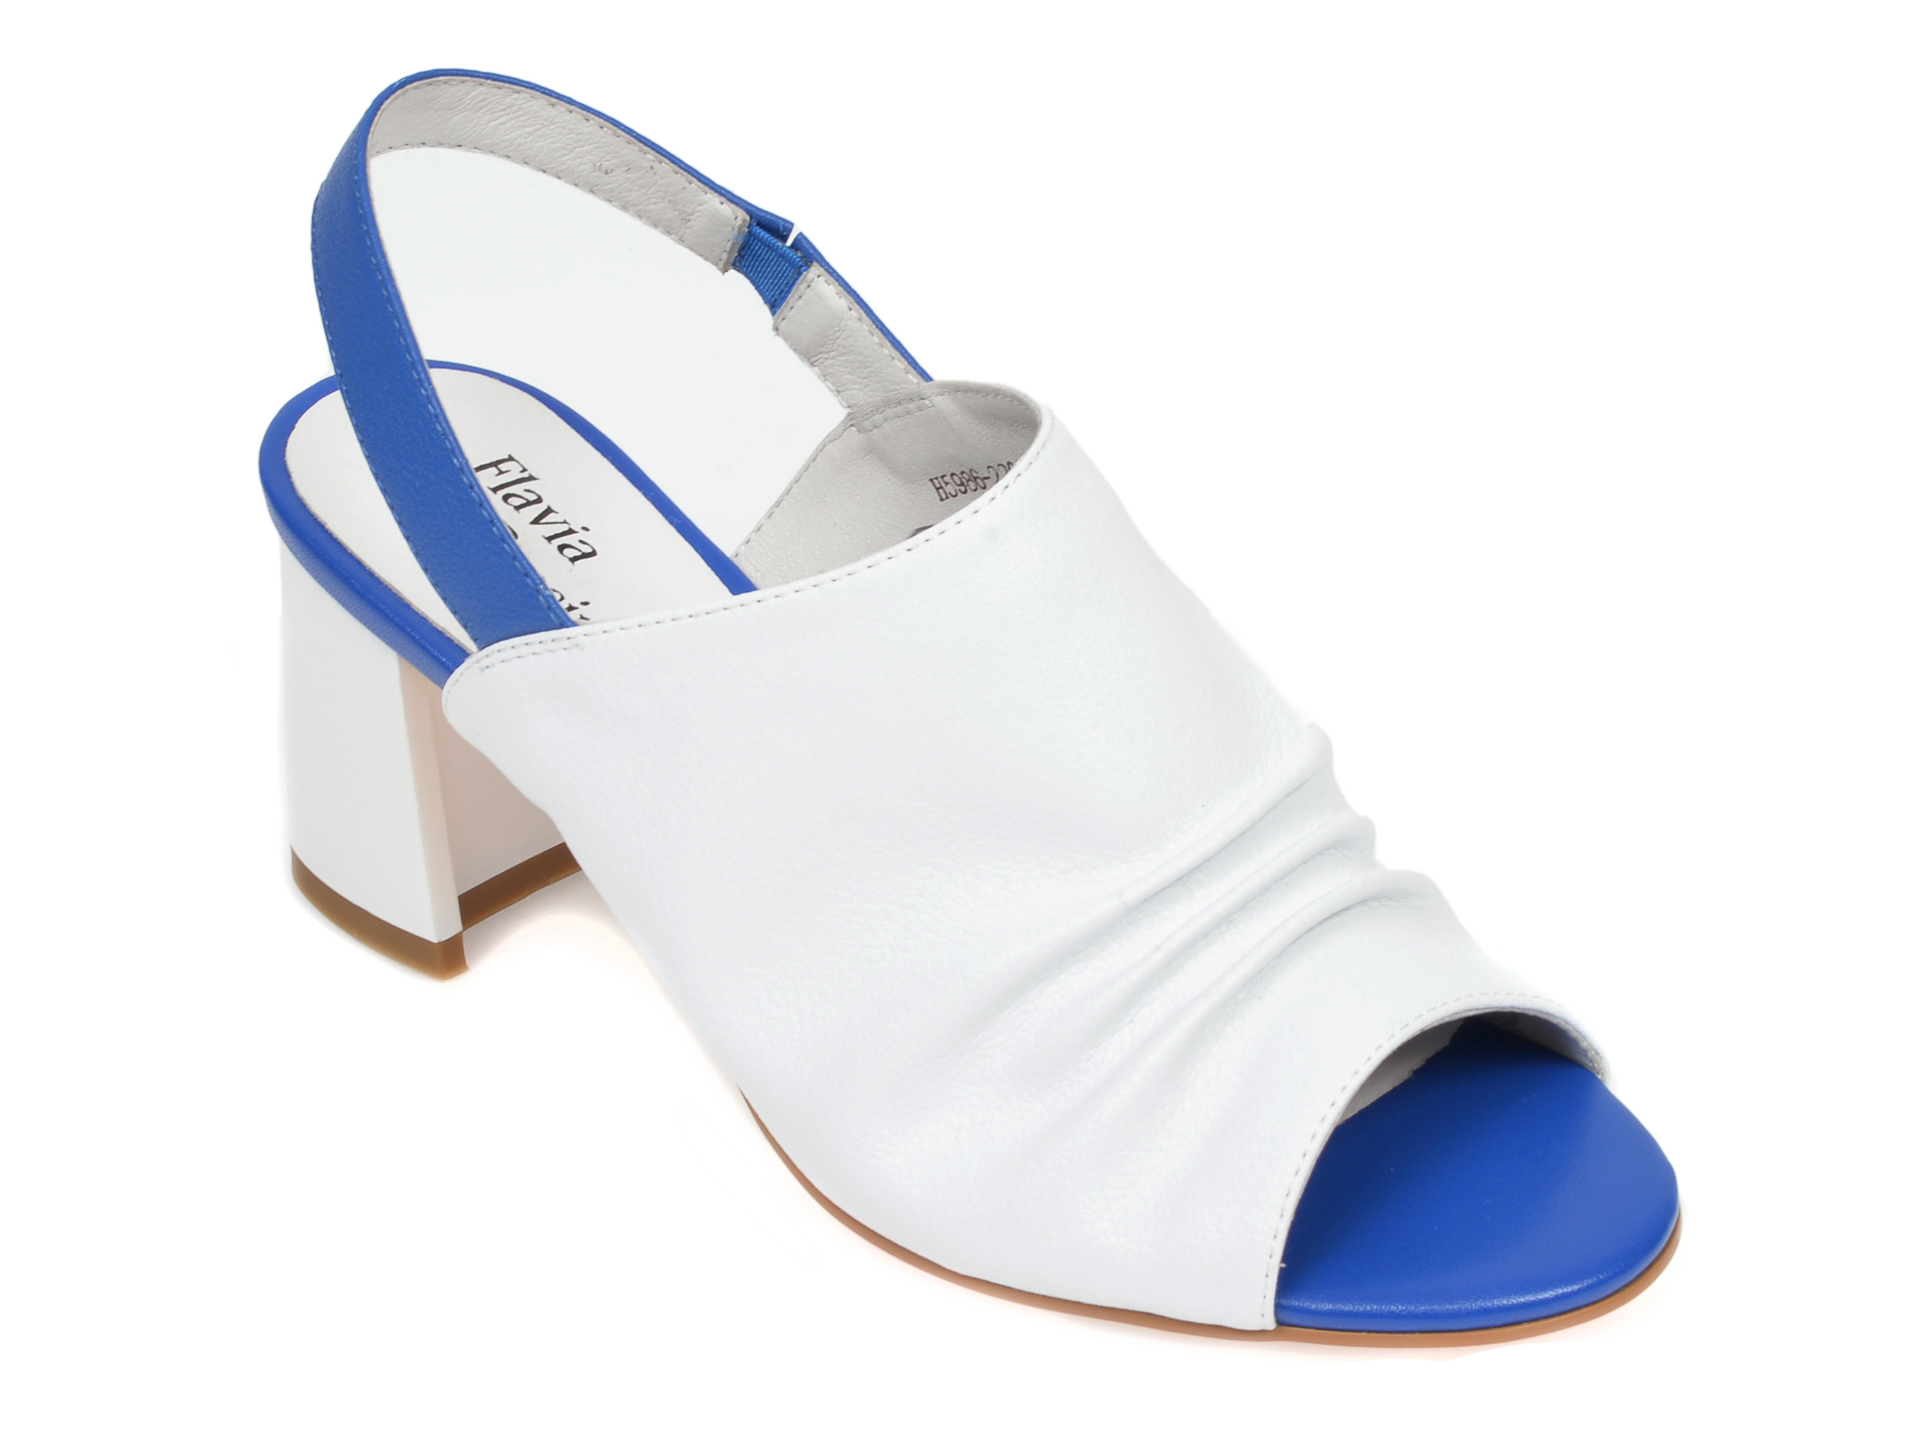 Sandale FLAVIA PASSINI albe, H598622, din piele naturala